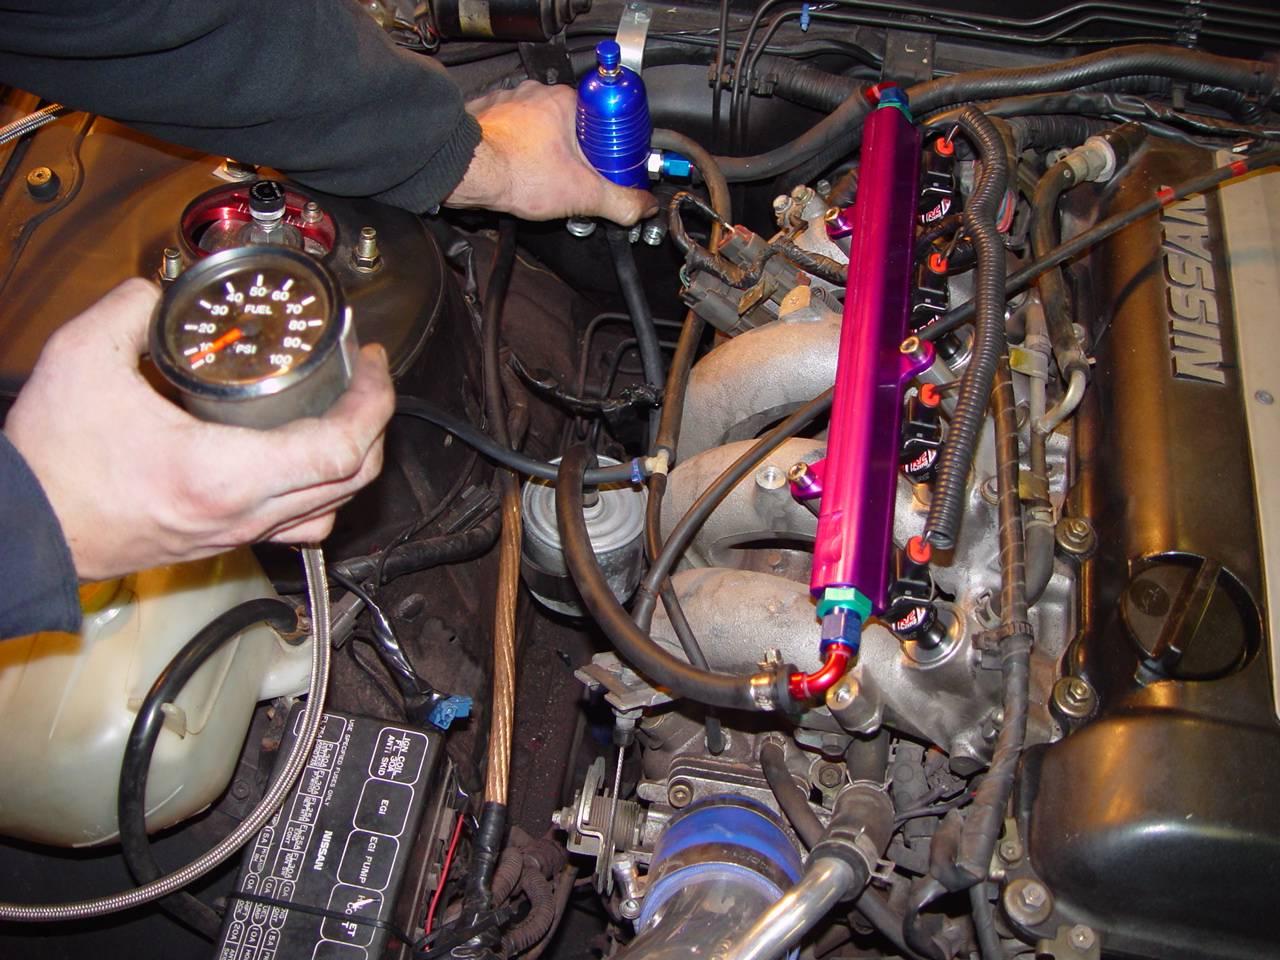 Fuel Regulator Install Wiring Diagrams Diagram S Max Pressure Step By Rh Customcarperformance Com Installation